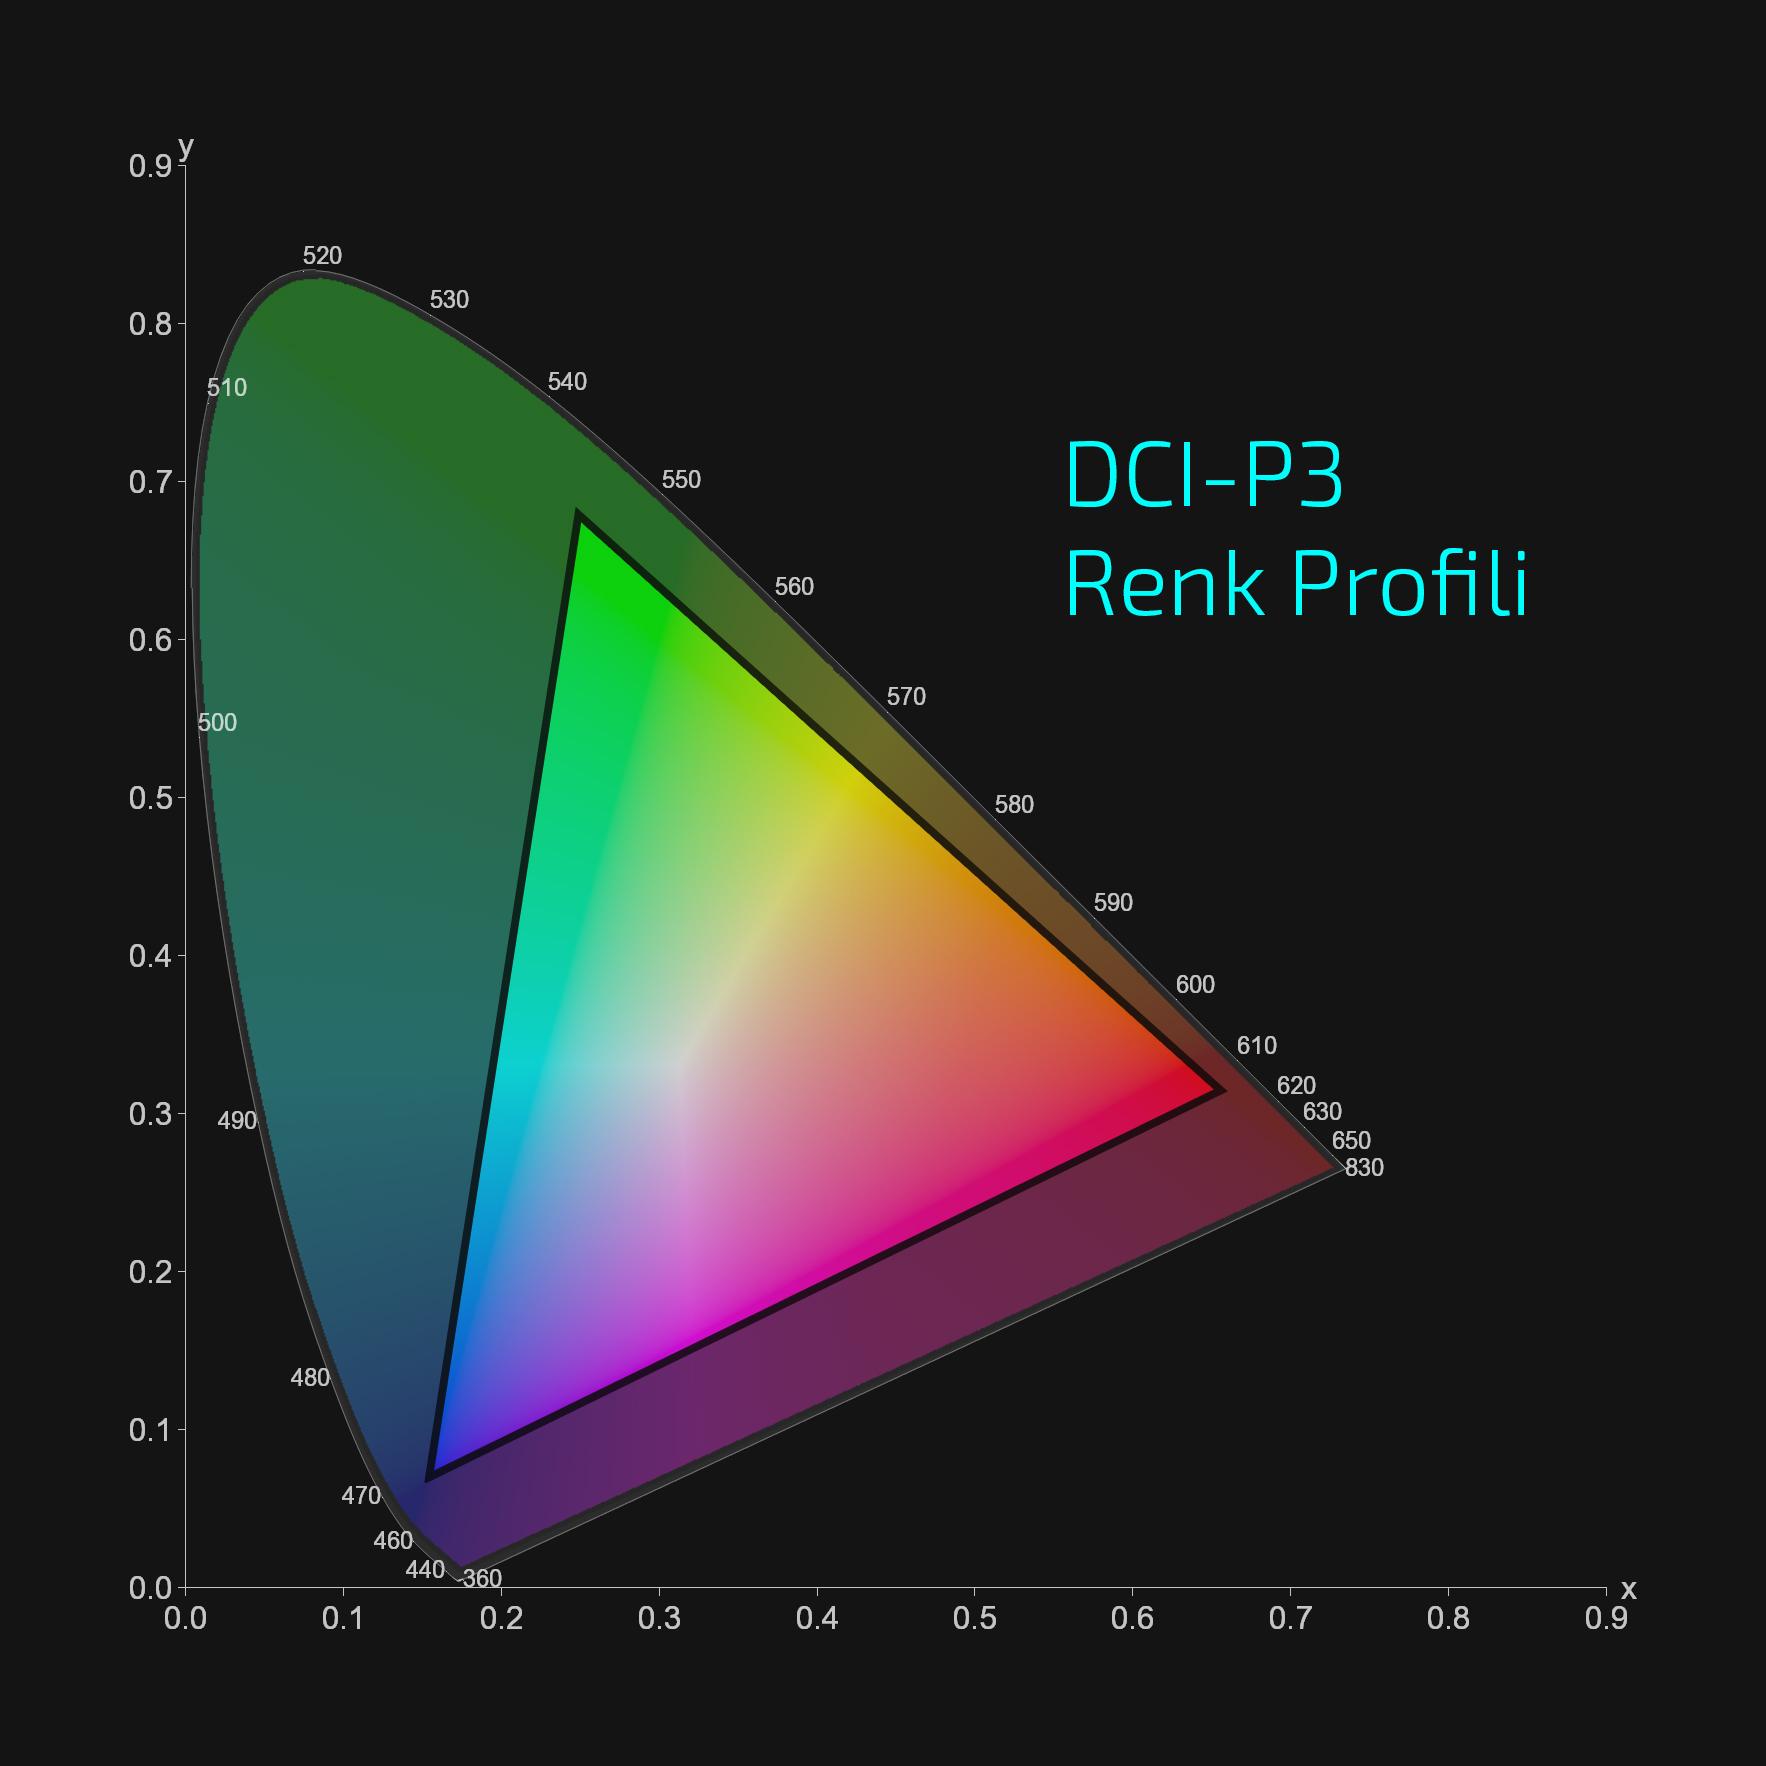 DCI-P3.jpg